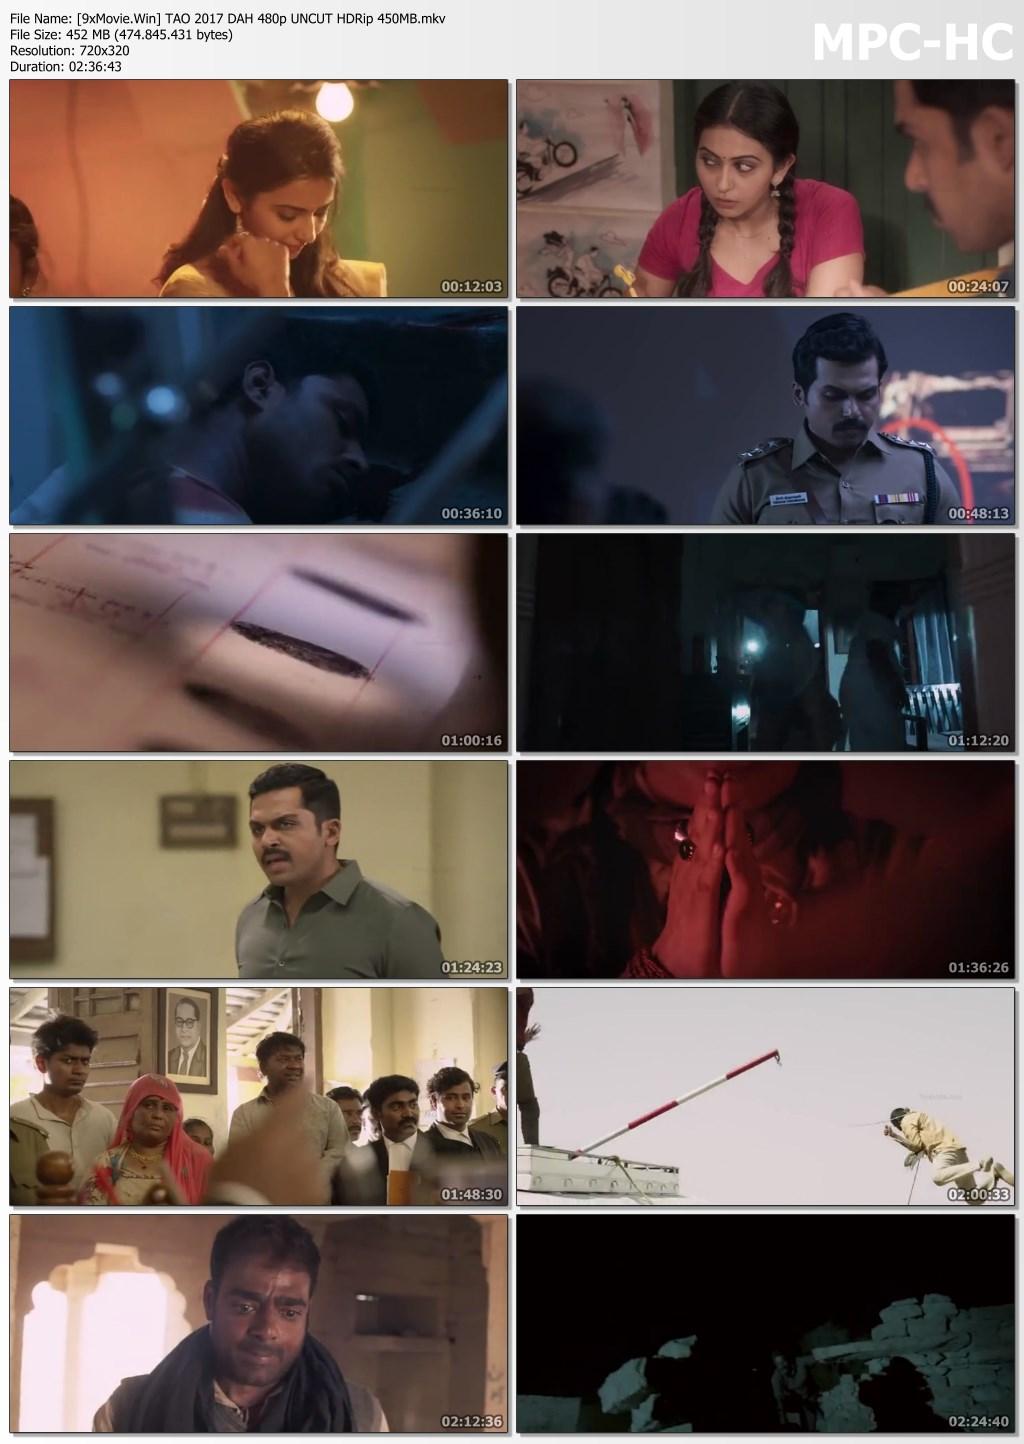 Theeran Adhigaram Ondru 2017 Dual Audio Hindi 480p UNCUT HDRip x264 450MB